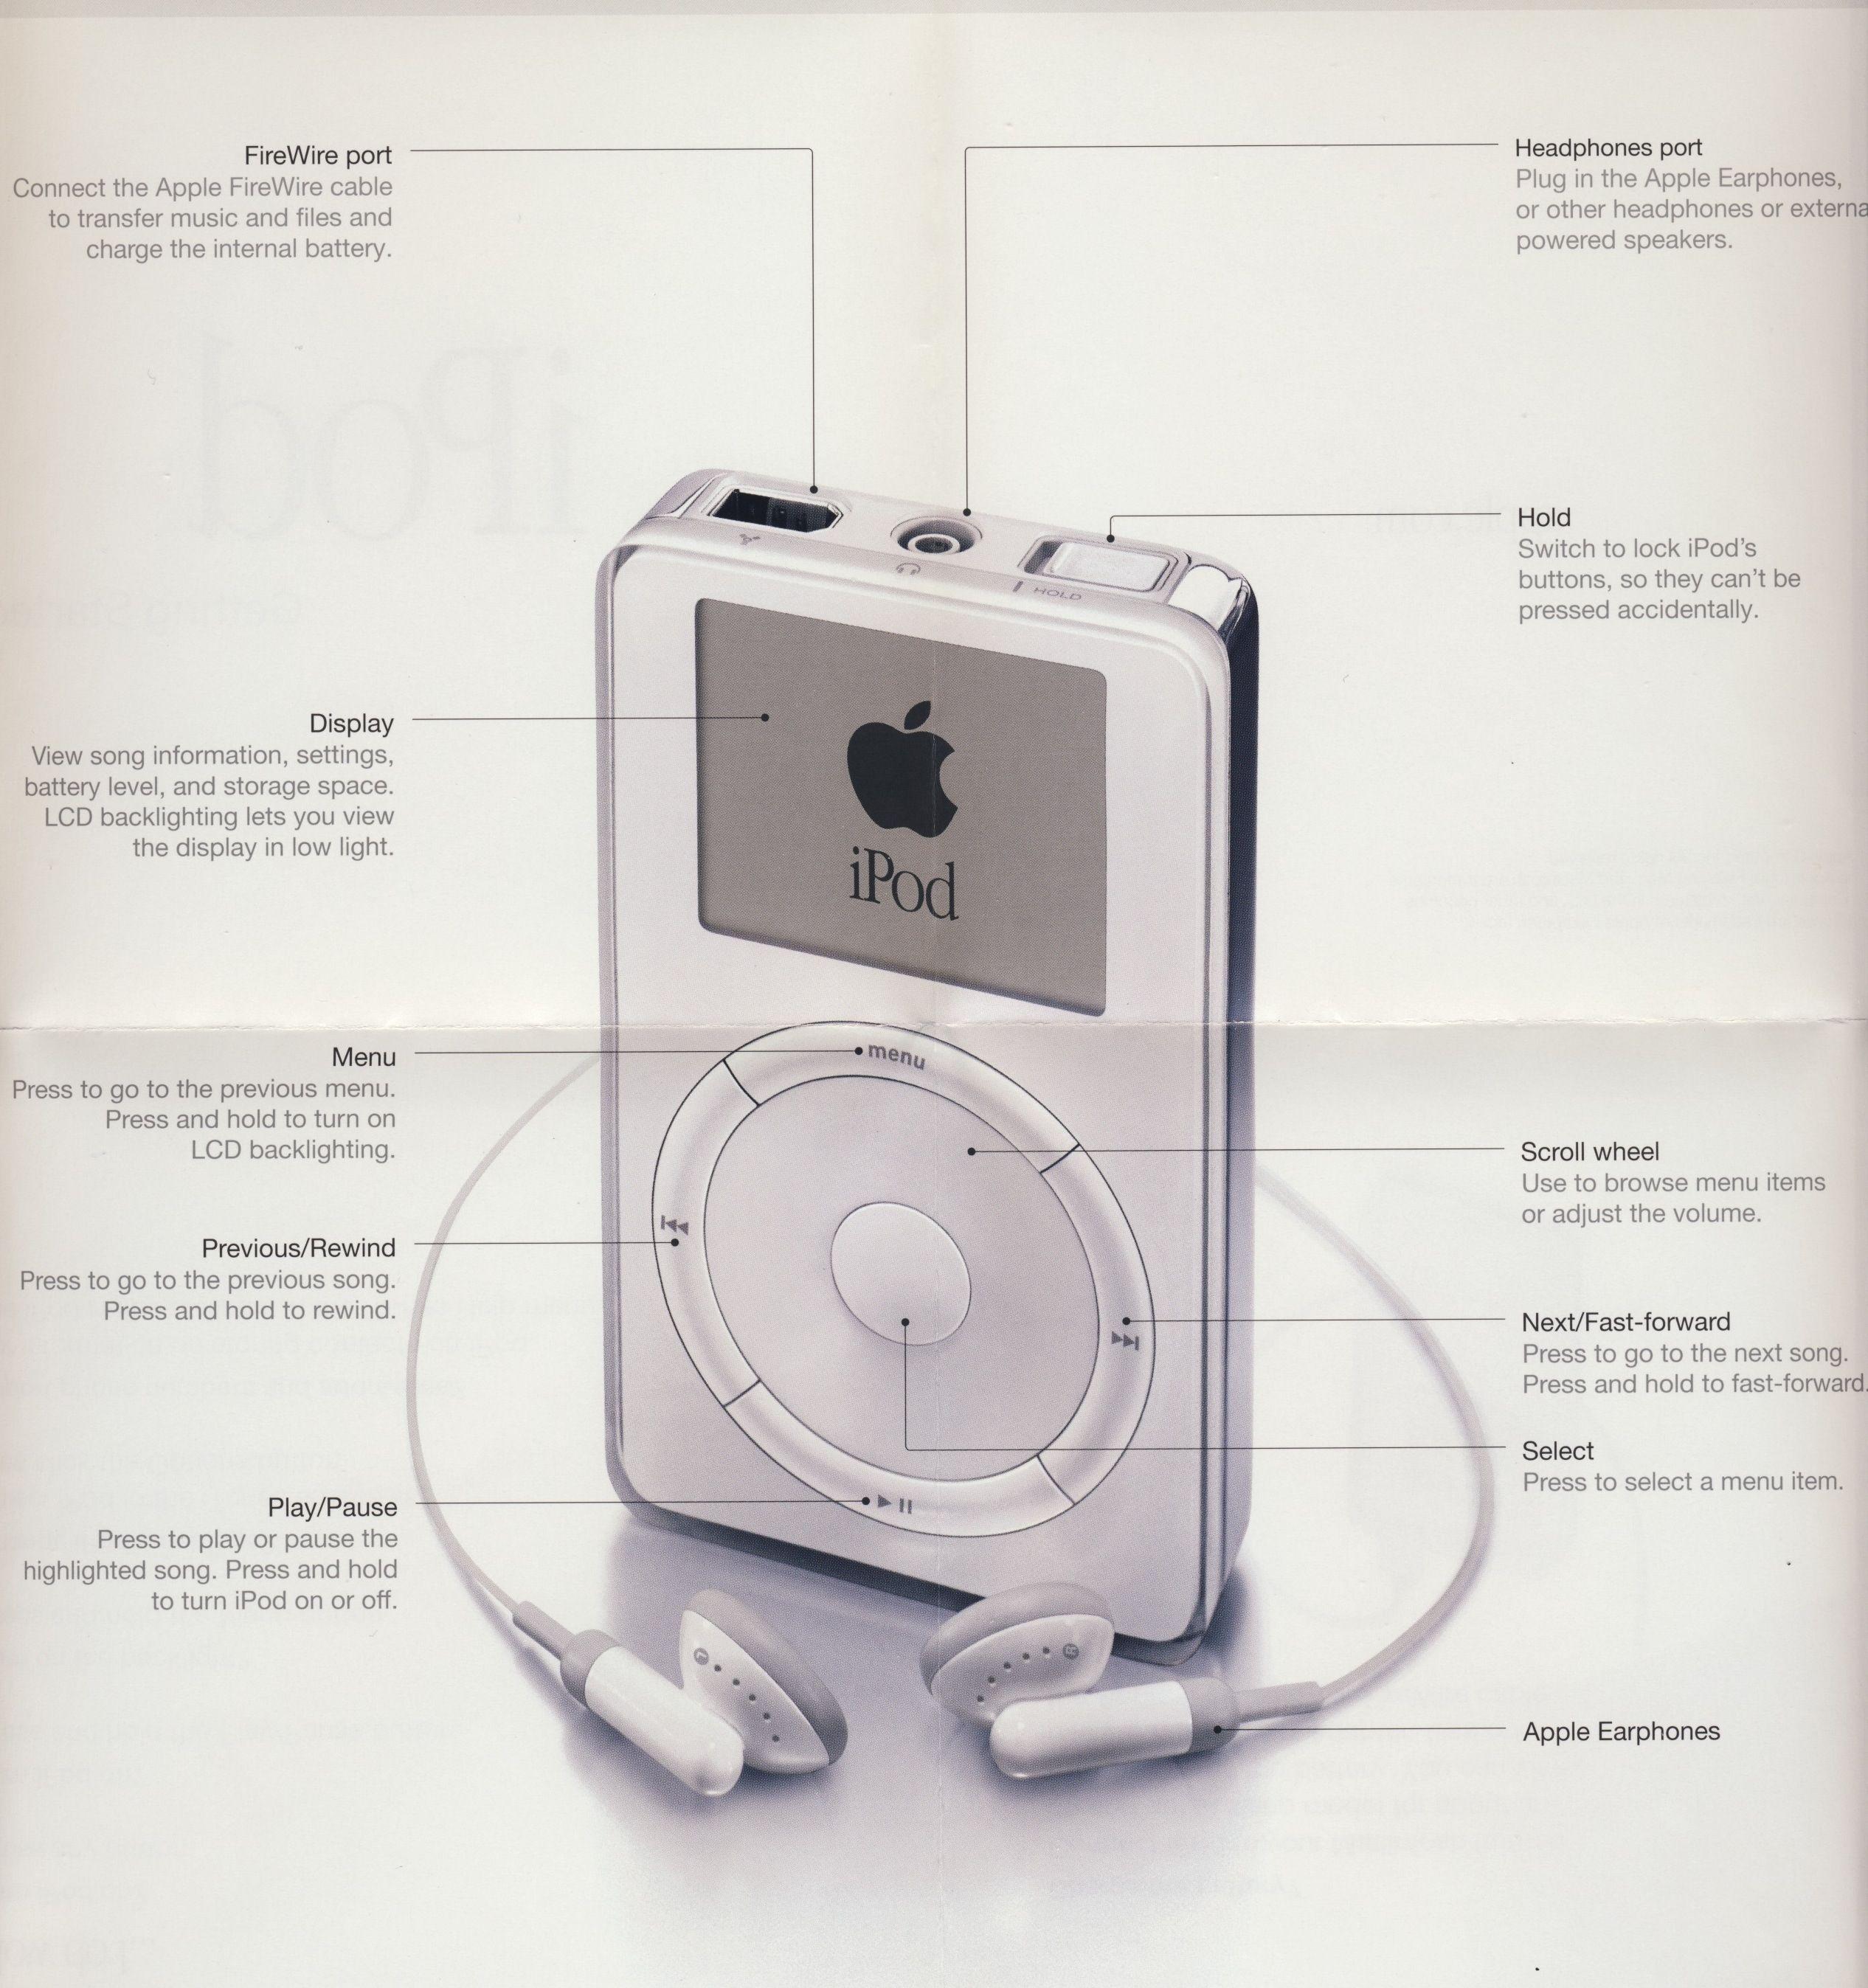 Apple-1st-Gen-iPod-Getting-Started-Booklet-5.jpeg 2,532×2,695 ...